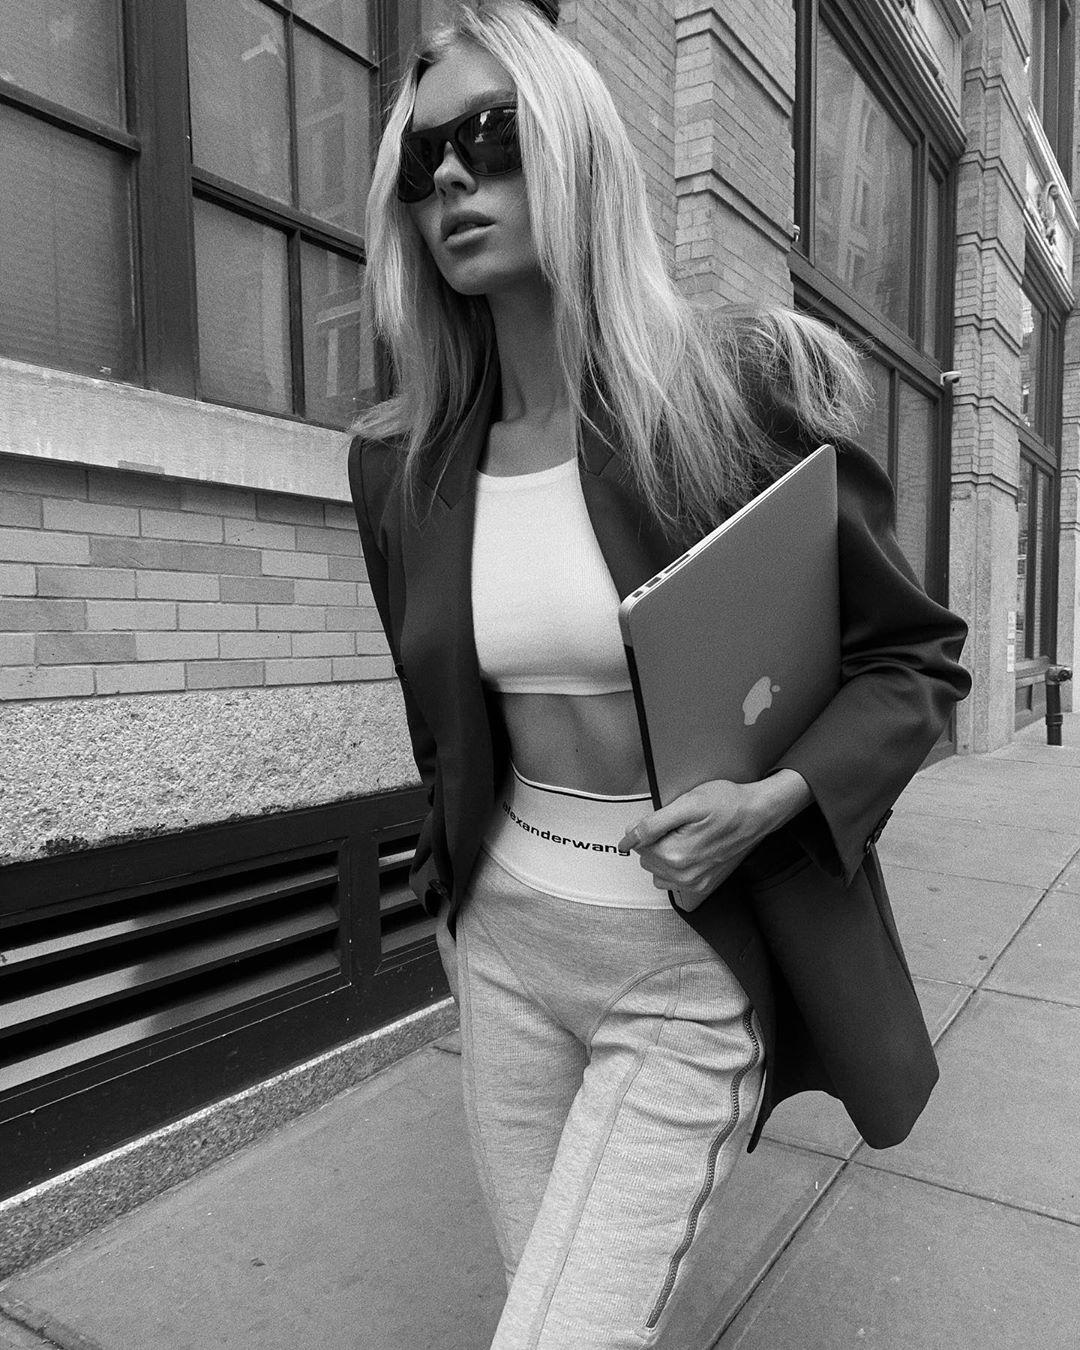 Impedir Contra la voluntad Meandro  Elsa Hosk Grey Skinny Alexander Wang Leggings Photoshoot Spring Summer 2020  | SASSY DAILY Fashion News